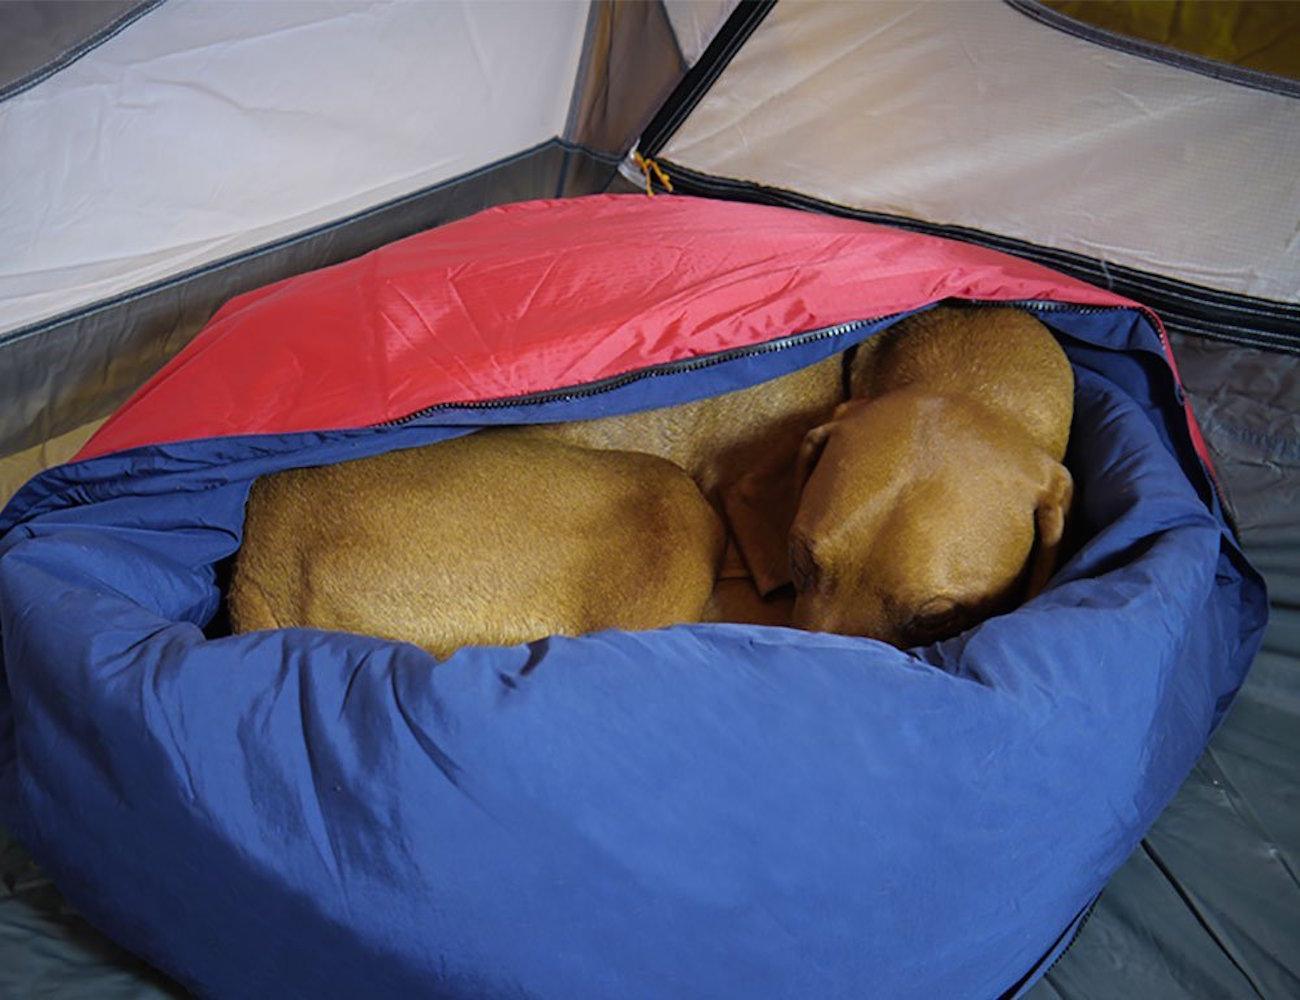 Noblecamper 2-in-1 Ultralight Travel Dog Bed and Sleeping Bag